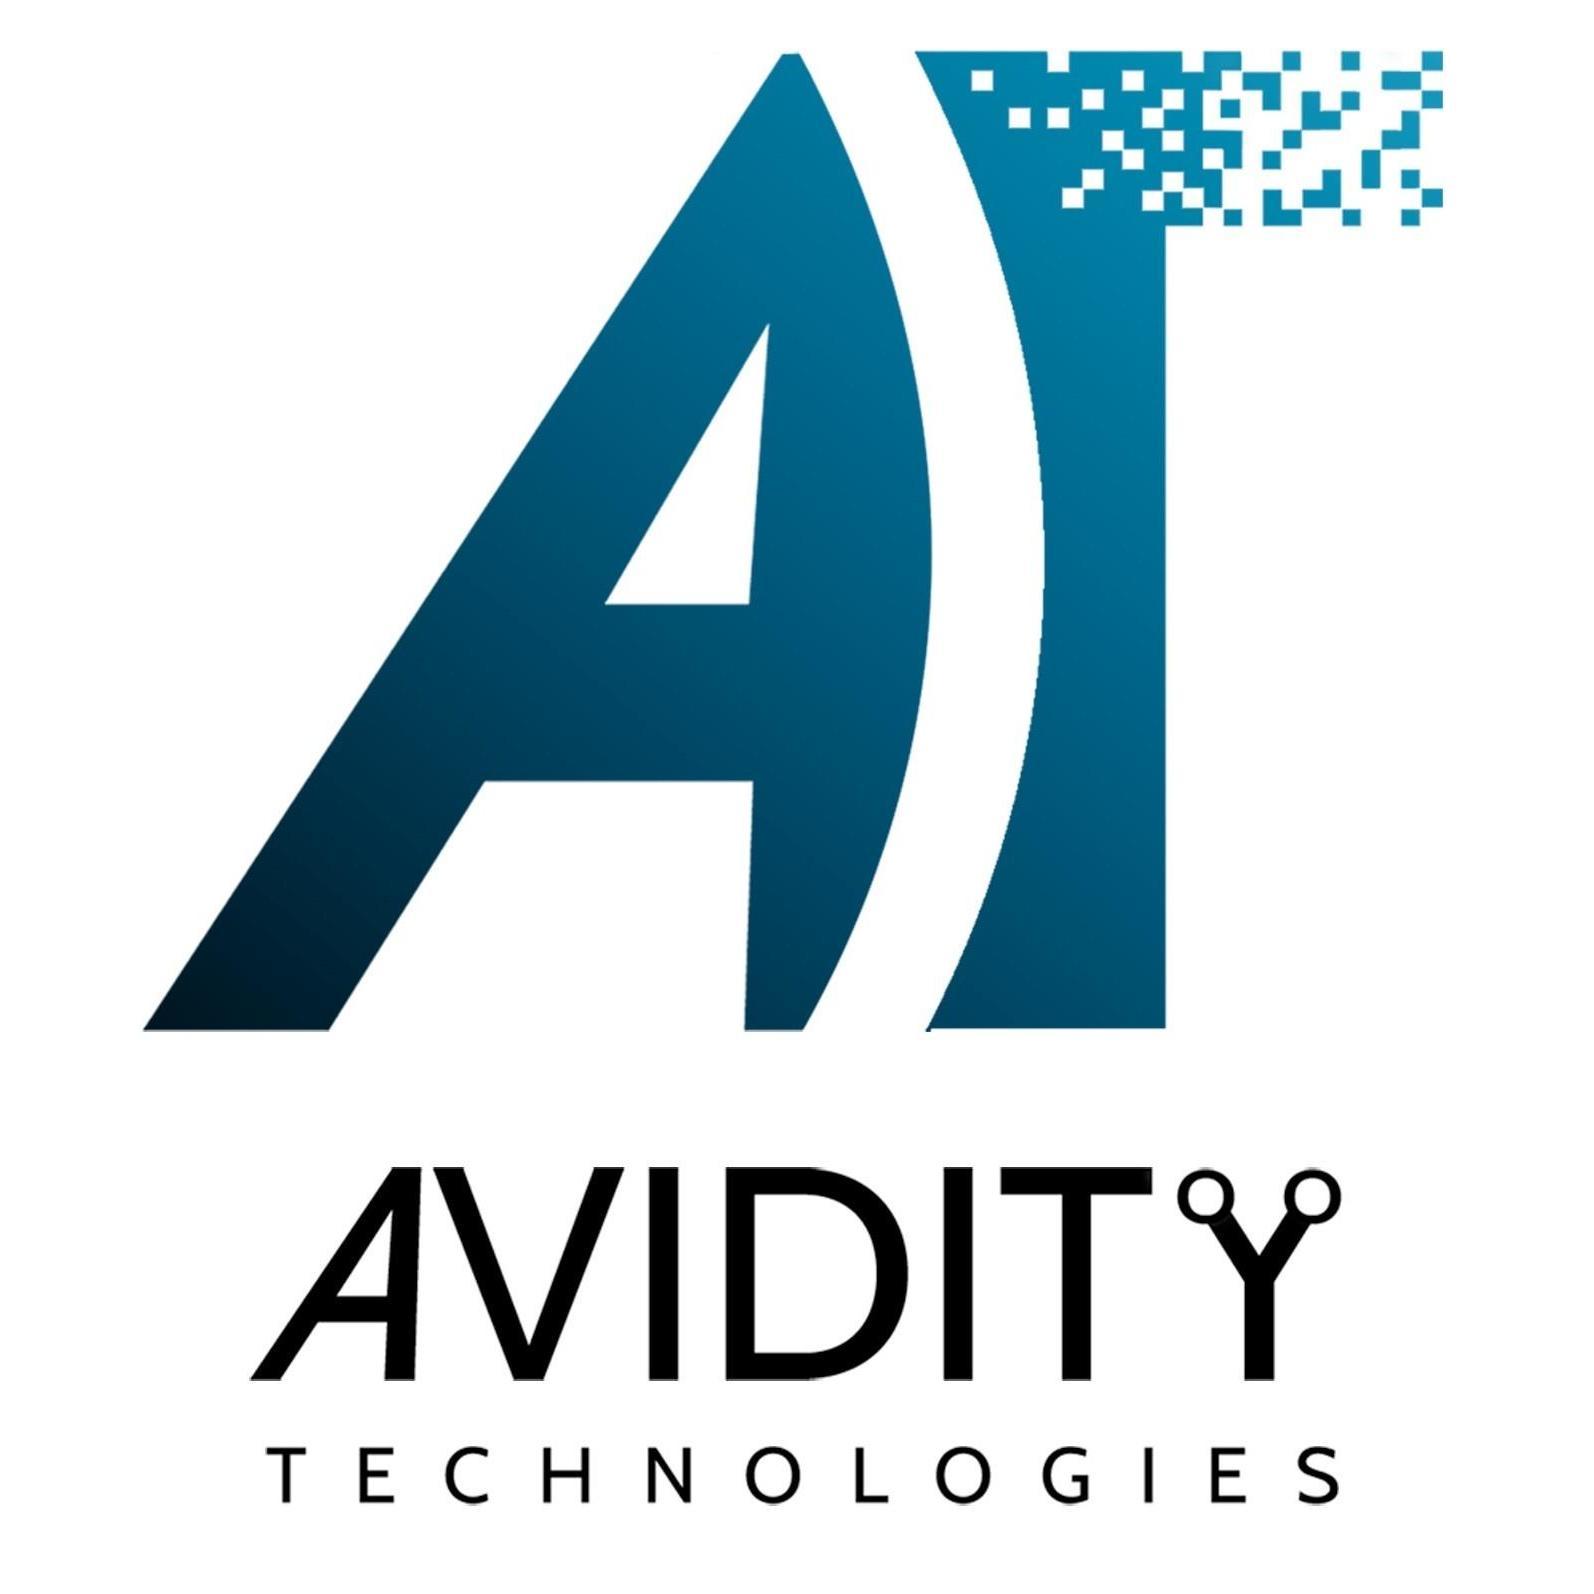 Avidity Technologies, Inc